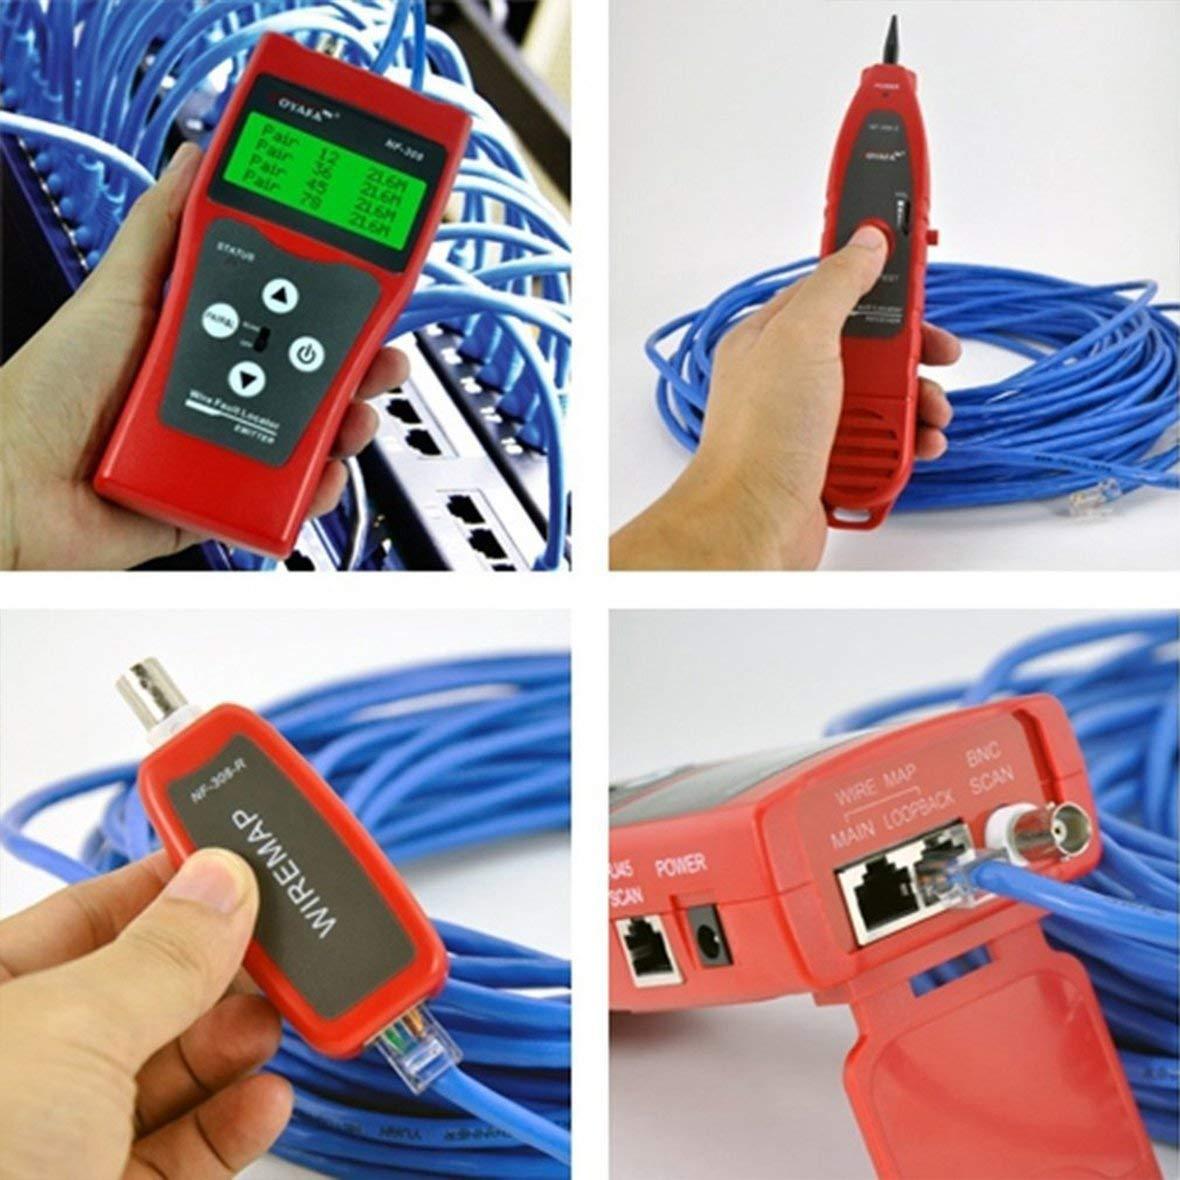 Heaviesk para Noyafa NF-308 Pantalla LCD multiprop/ósito Probador de Cables de tel/éfono de Red Localizador de l/íneas Buscador de Cables Buscador de Cables